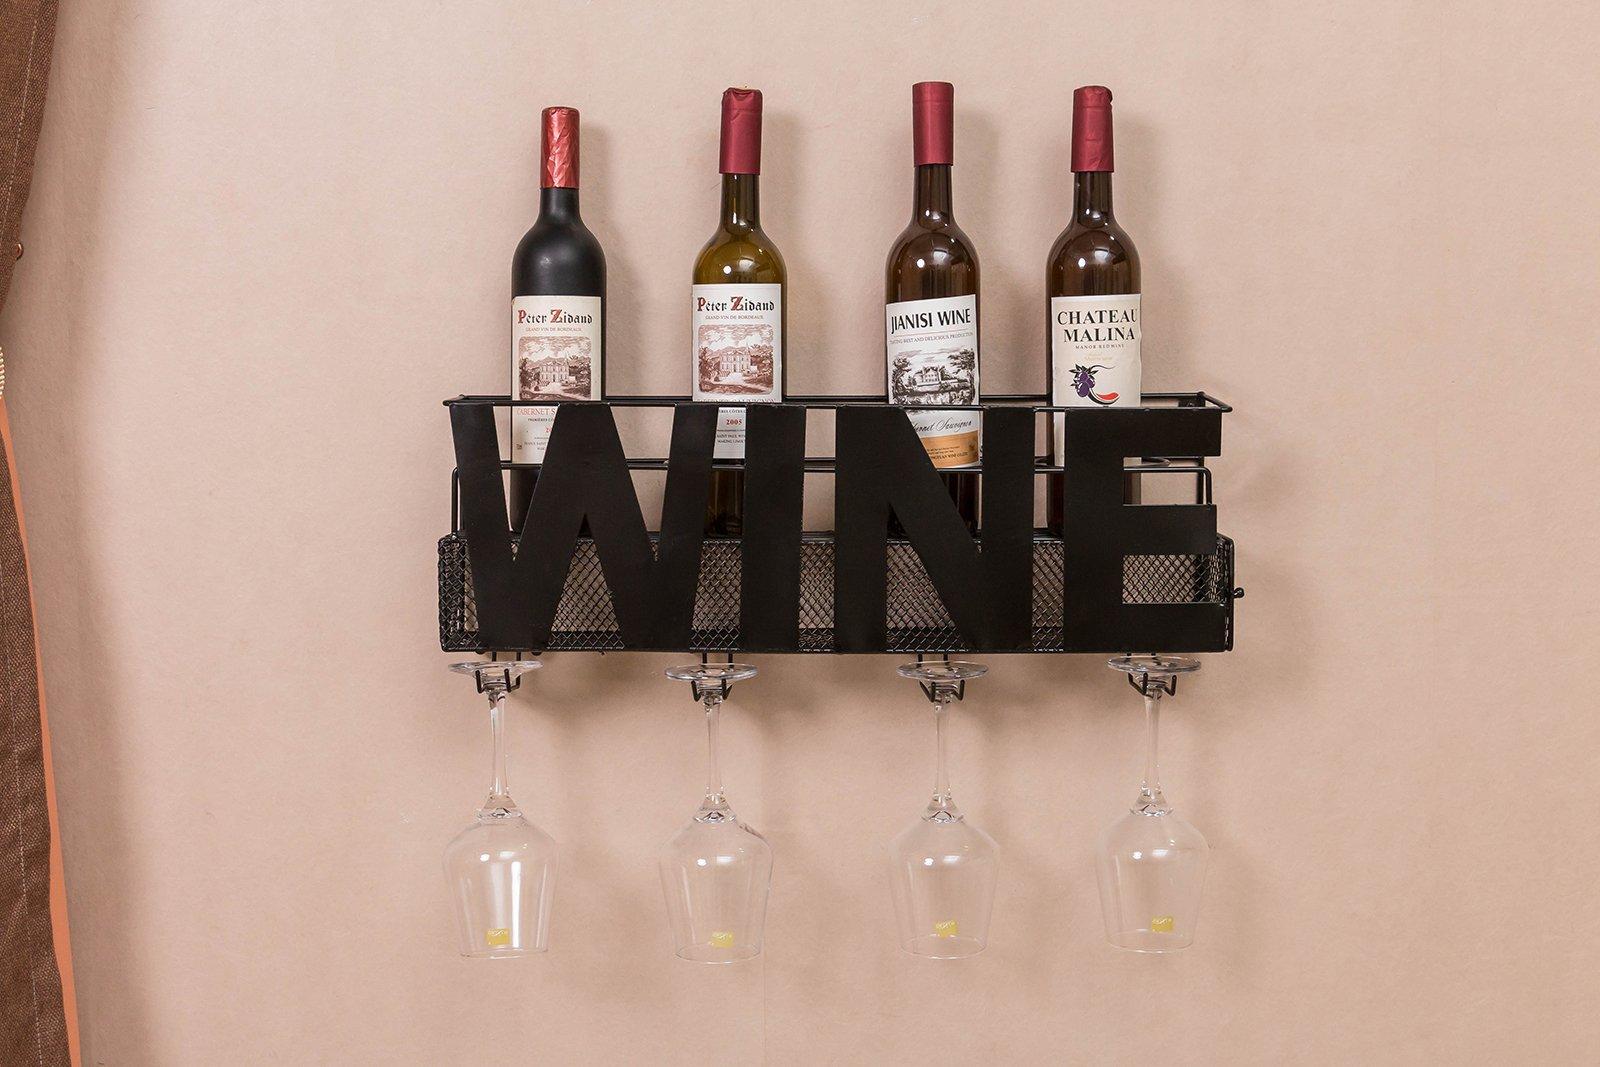 Metal Wine Glass Holder: Metal Wall Mount Wine Bottle Rack: Hold Wine Corks Wine